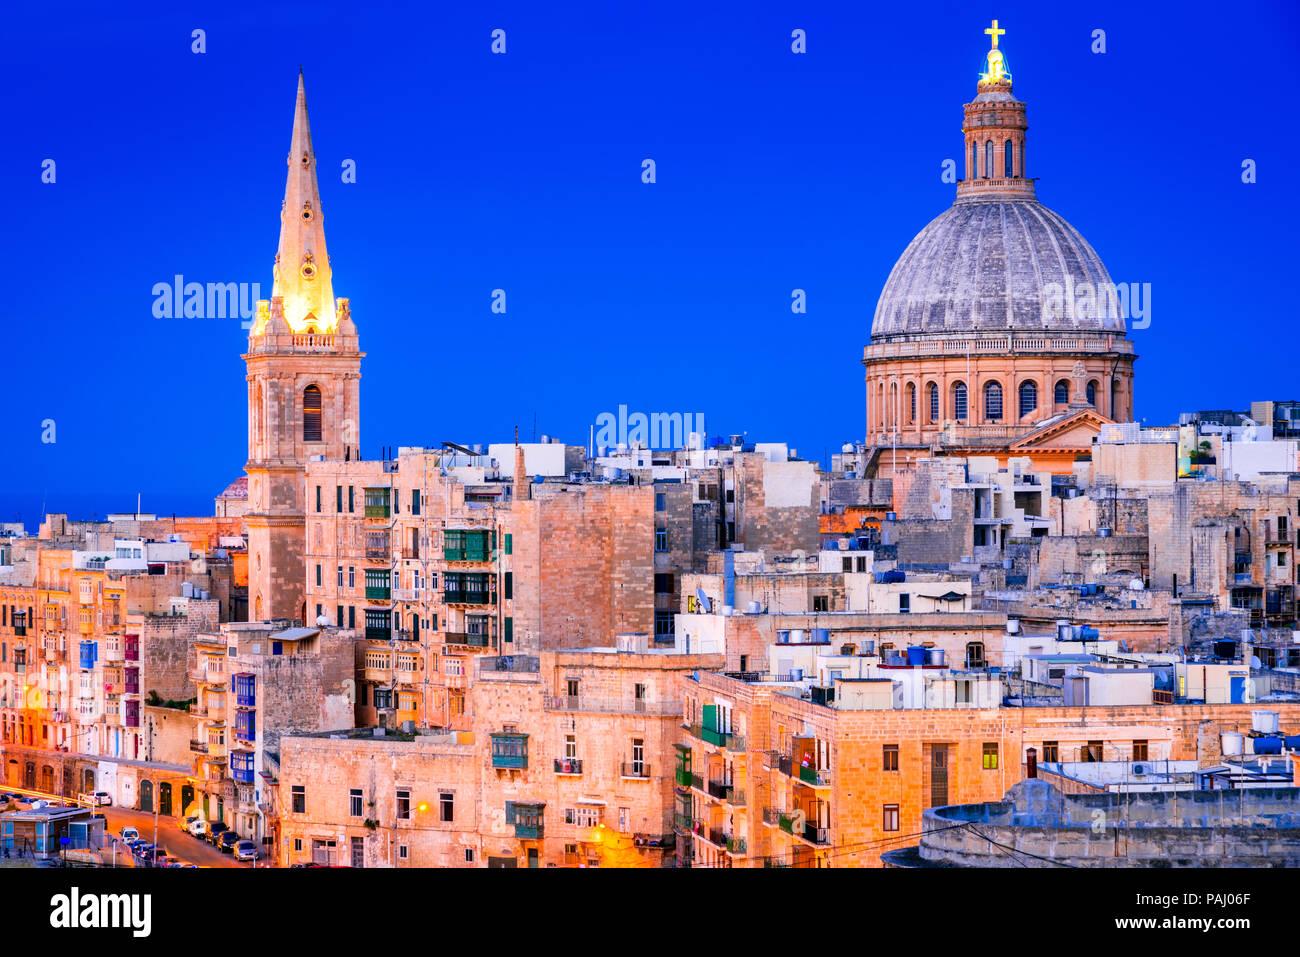 Malta nightview of Marsamxmett Harbour and Silema city, Valletta. - Stock Image